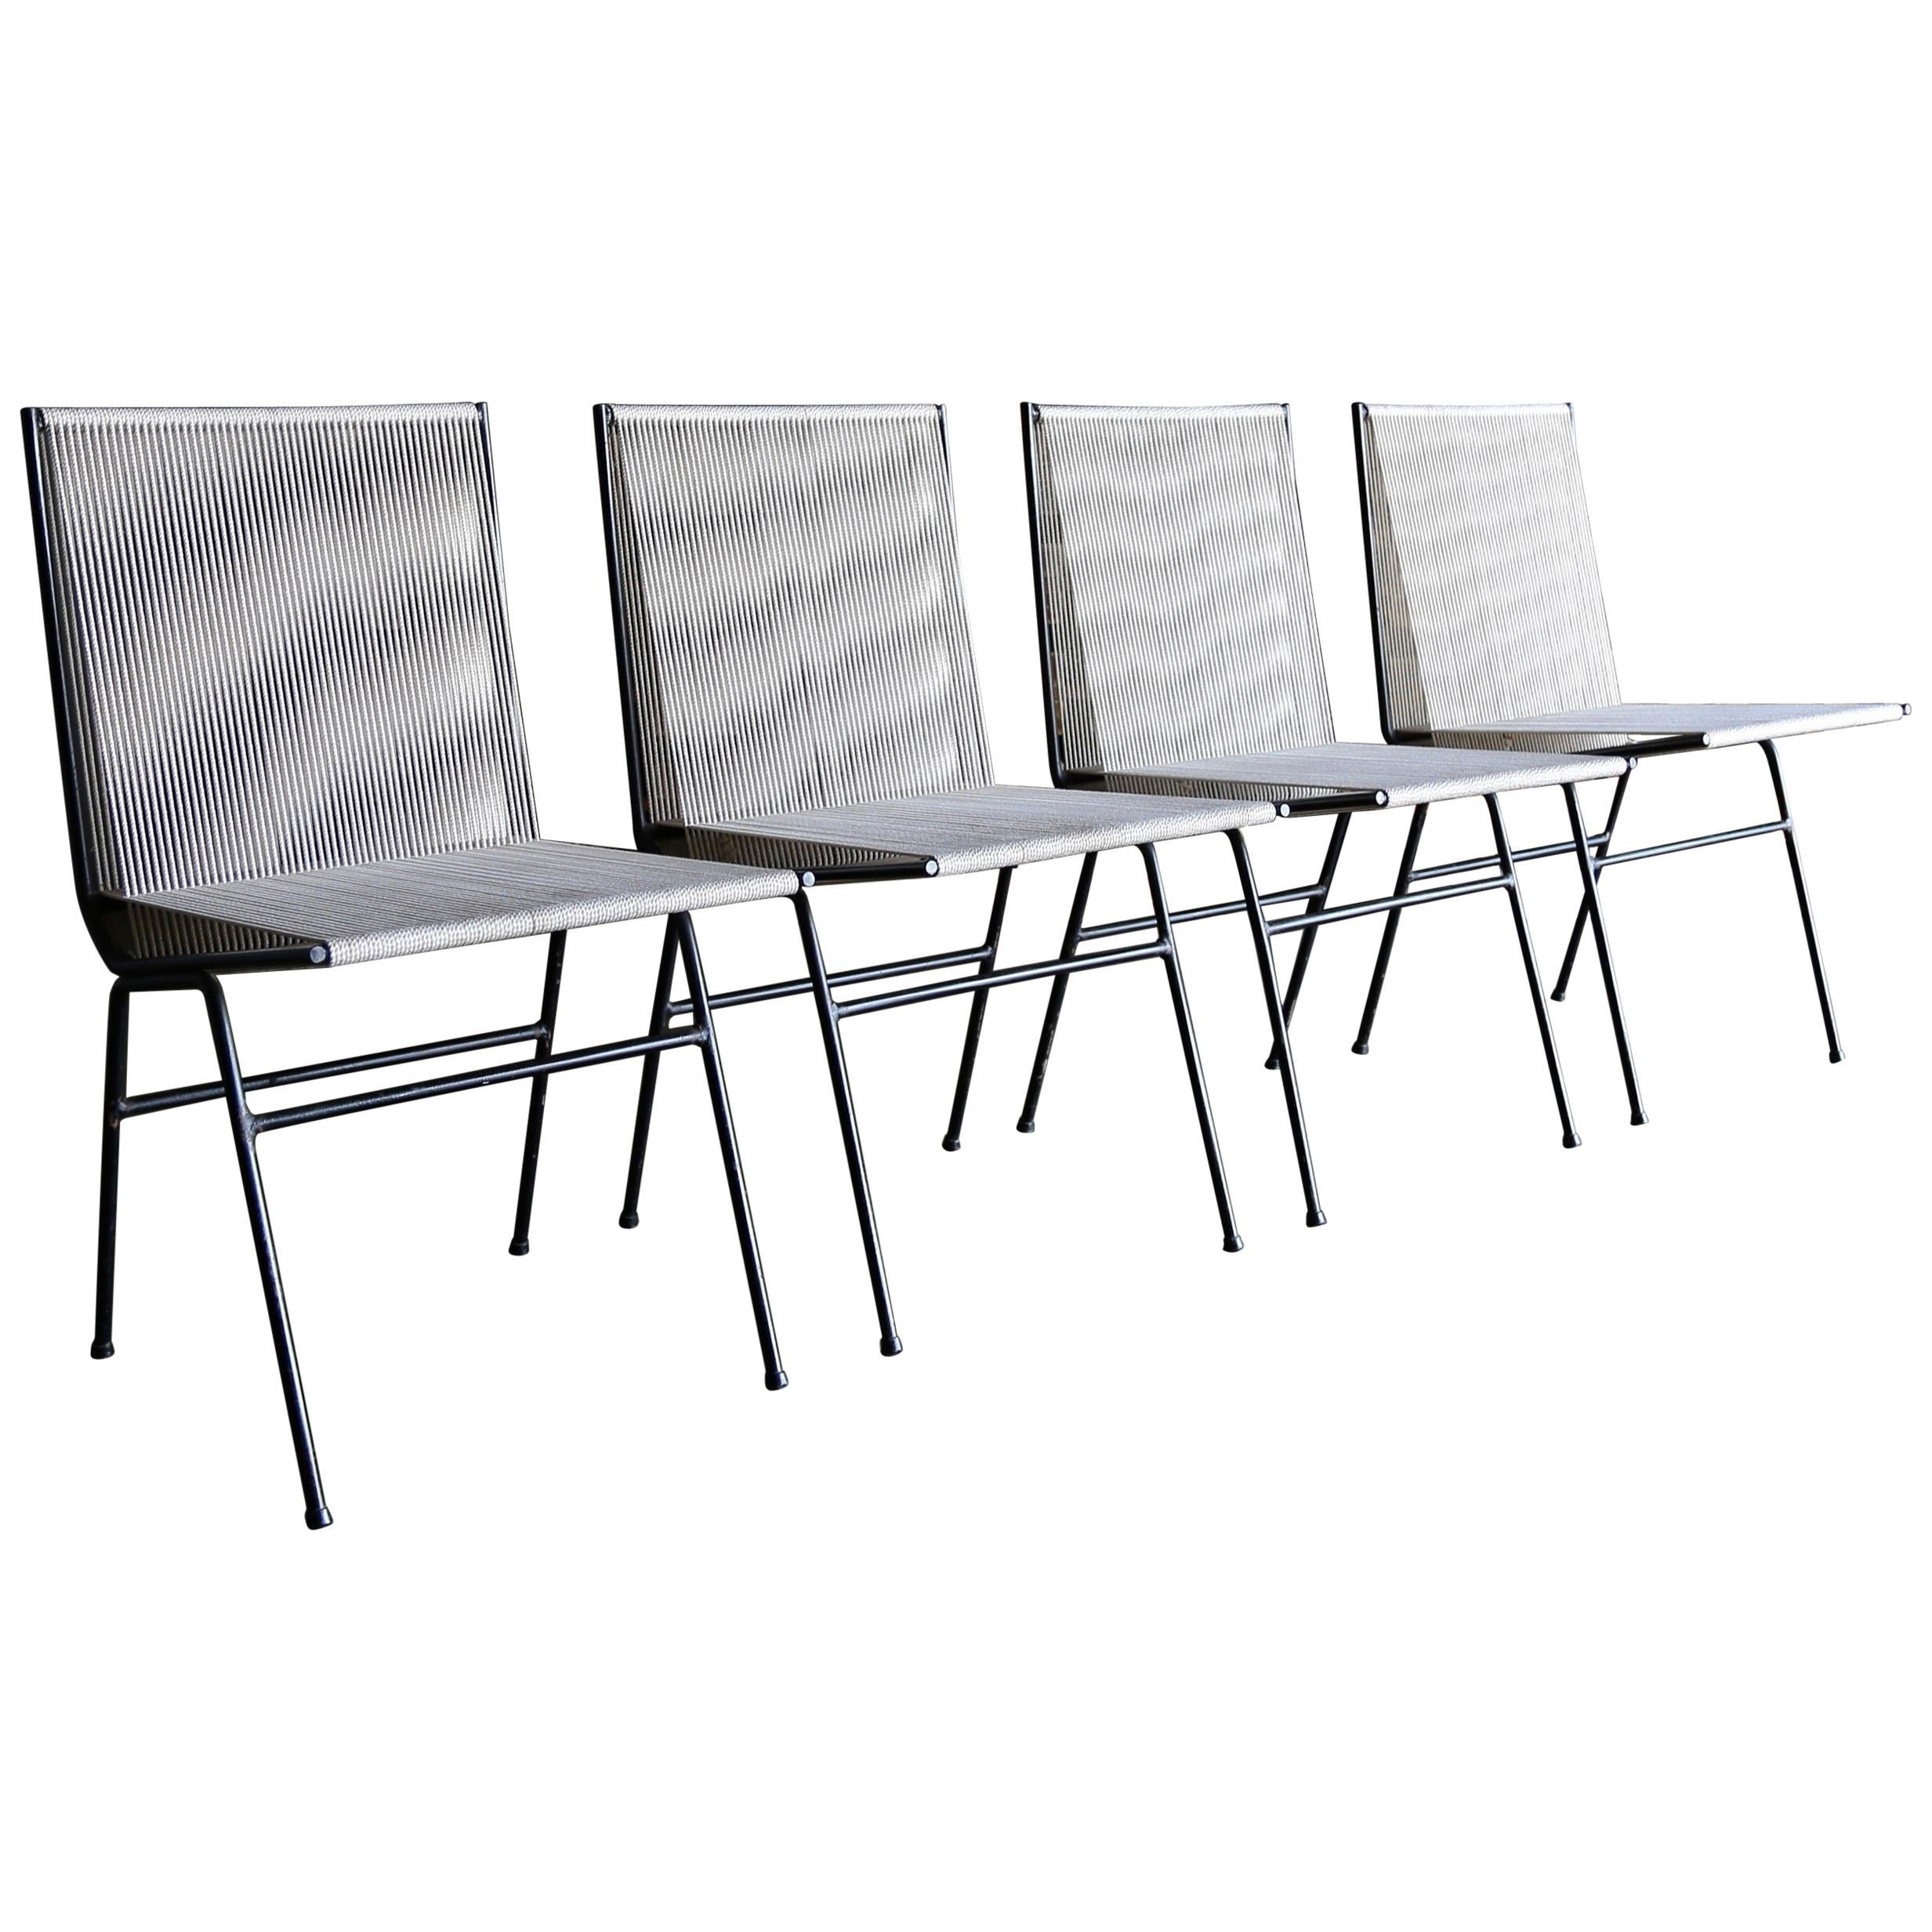 Allan Gould Dining Chairs, circa 1952